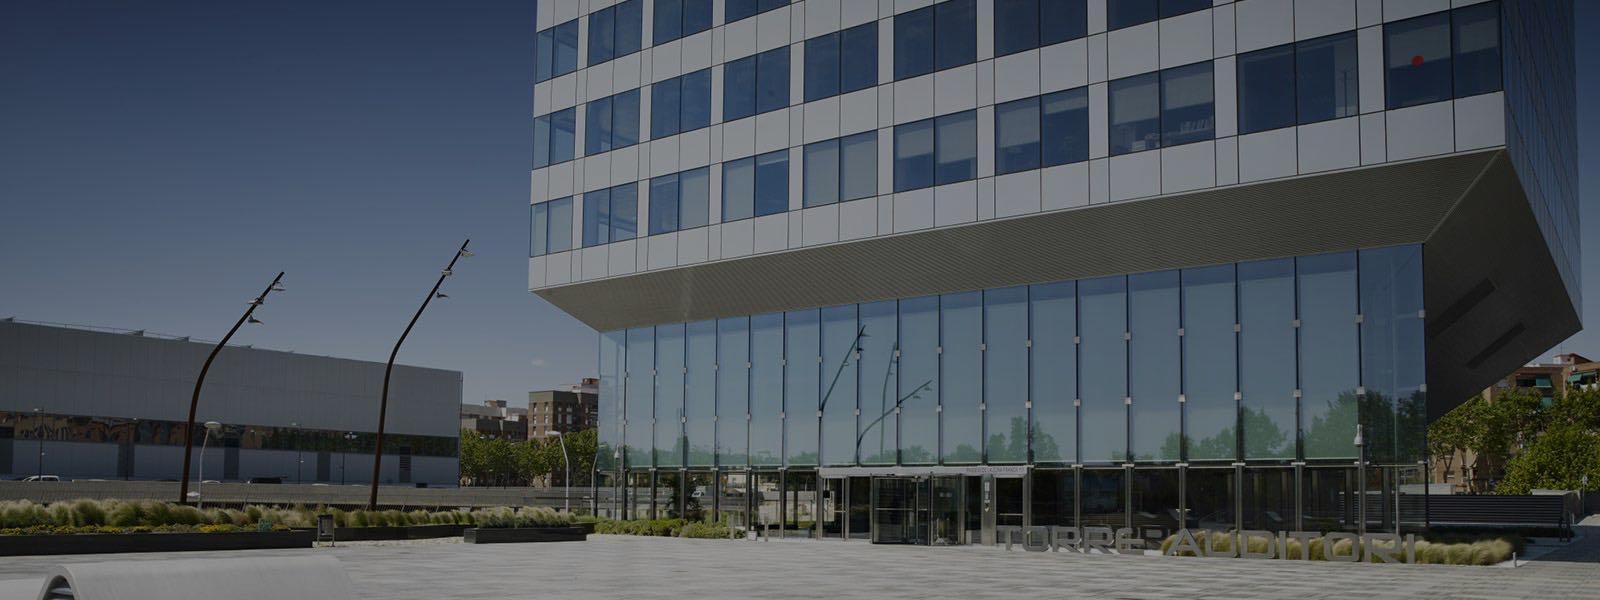 Humboldt centro de idiomas Barcelona